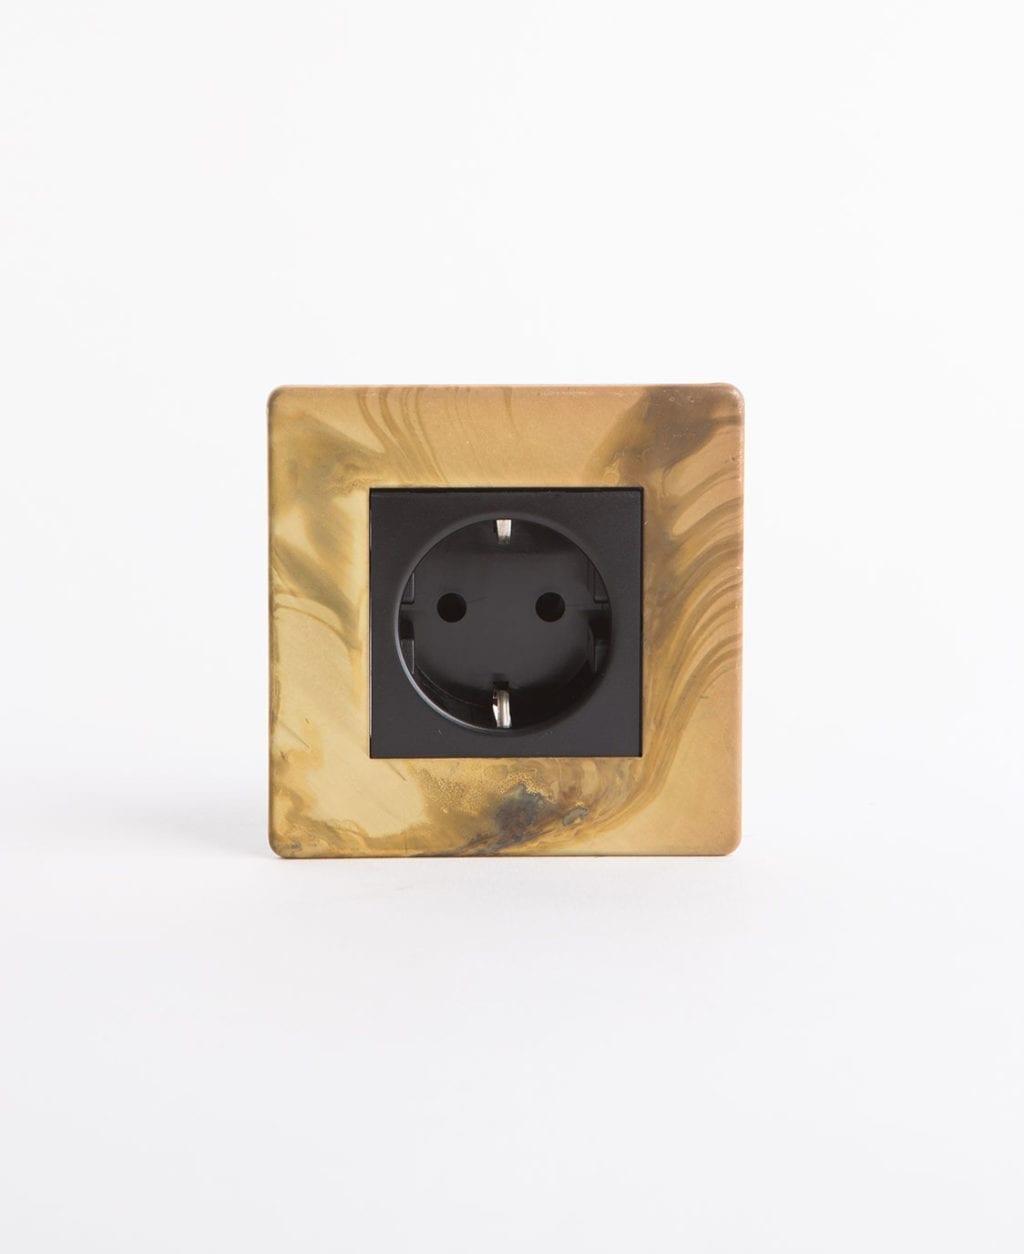 gold Schuko single socket with black insert